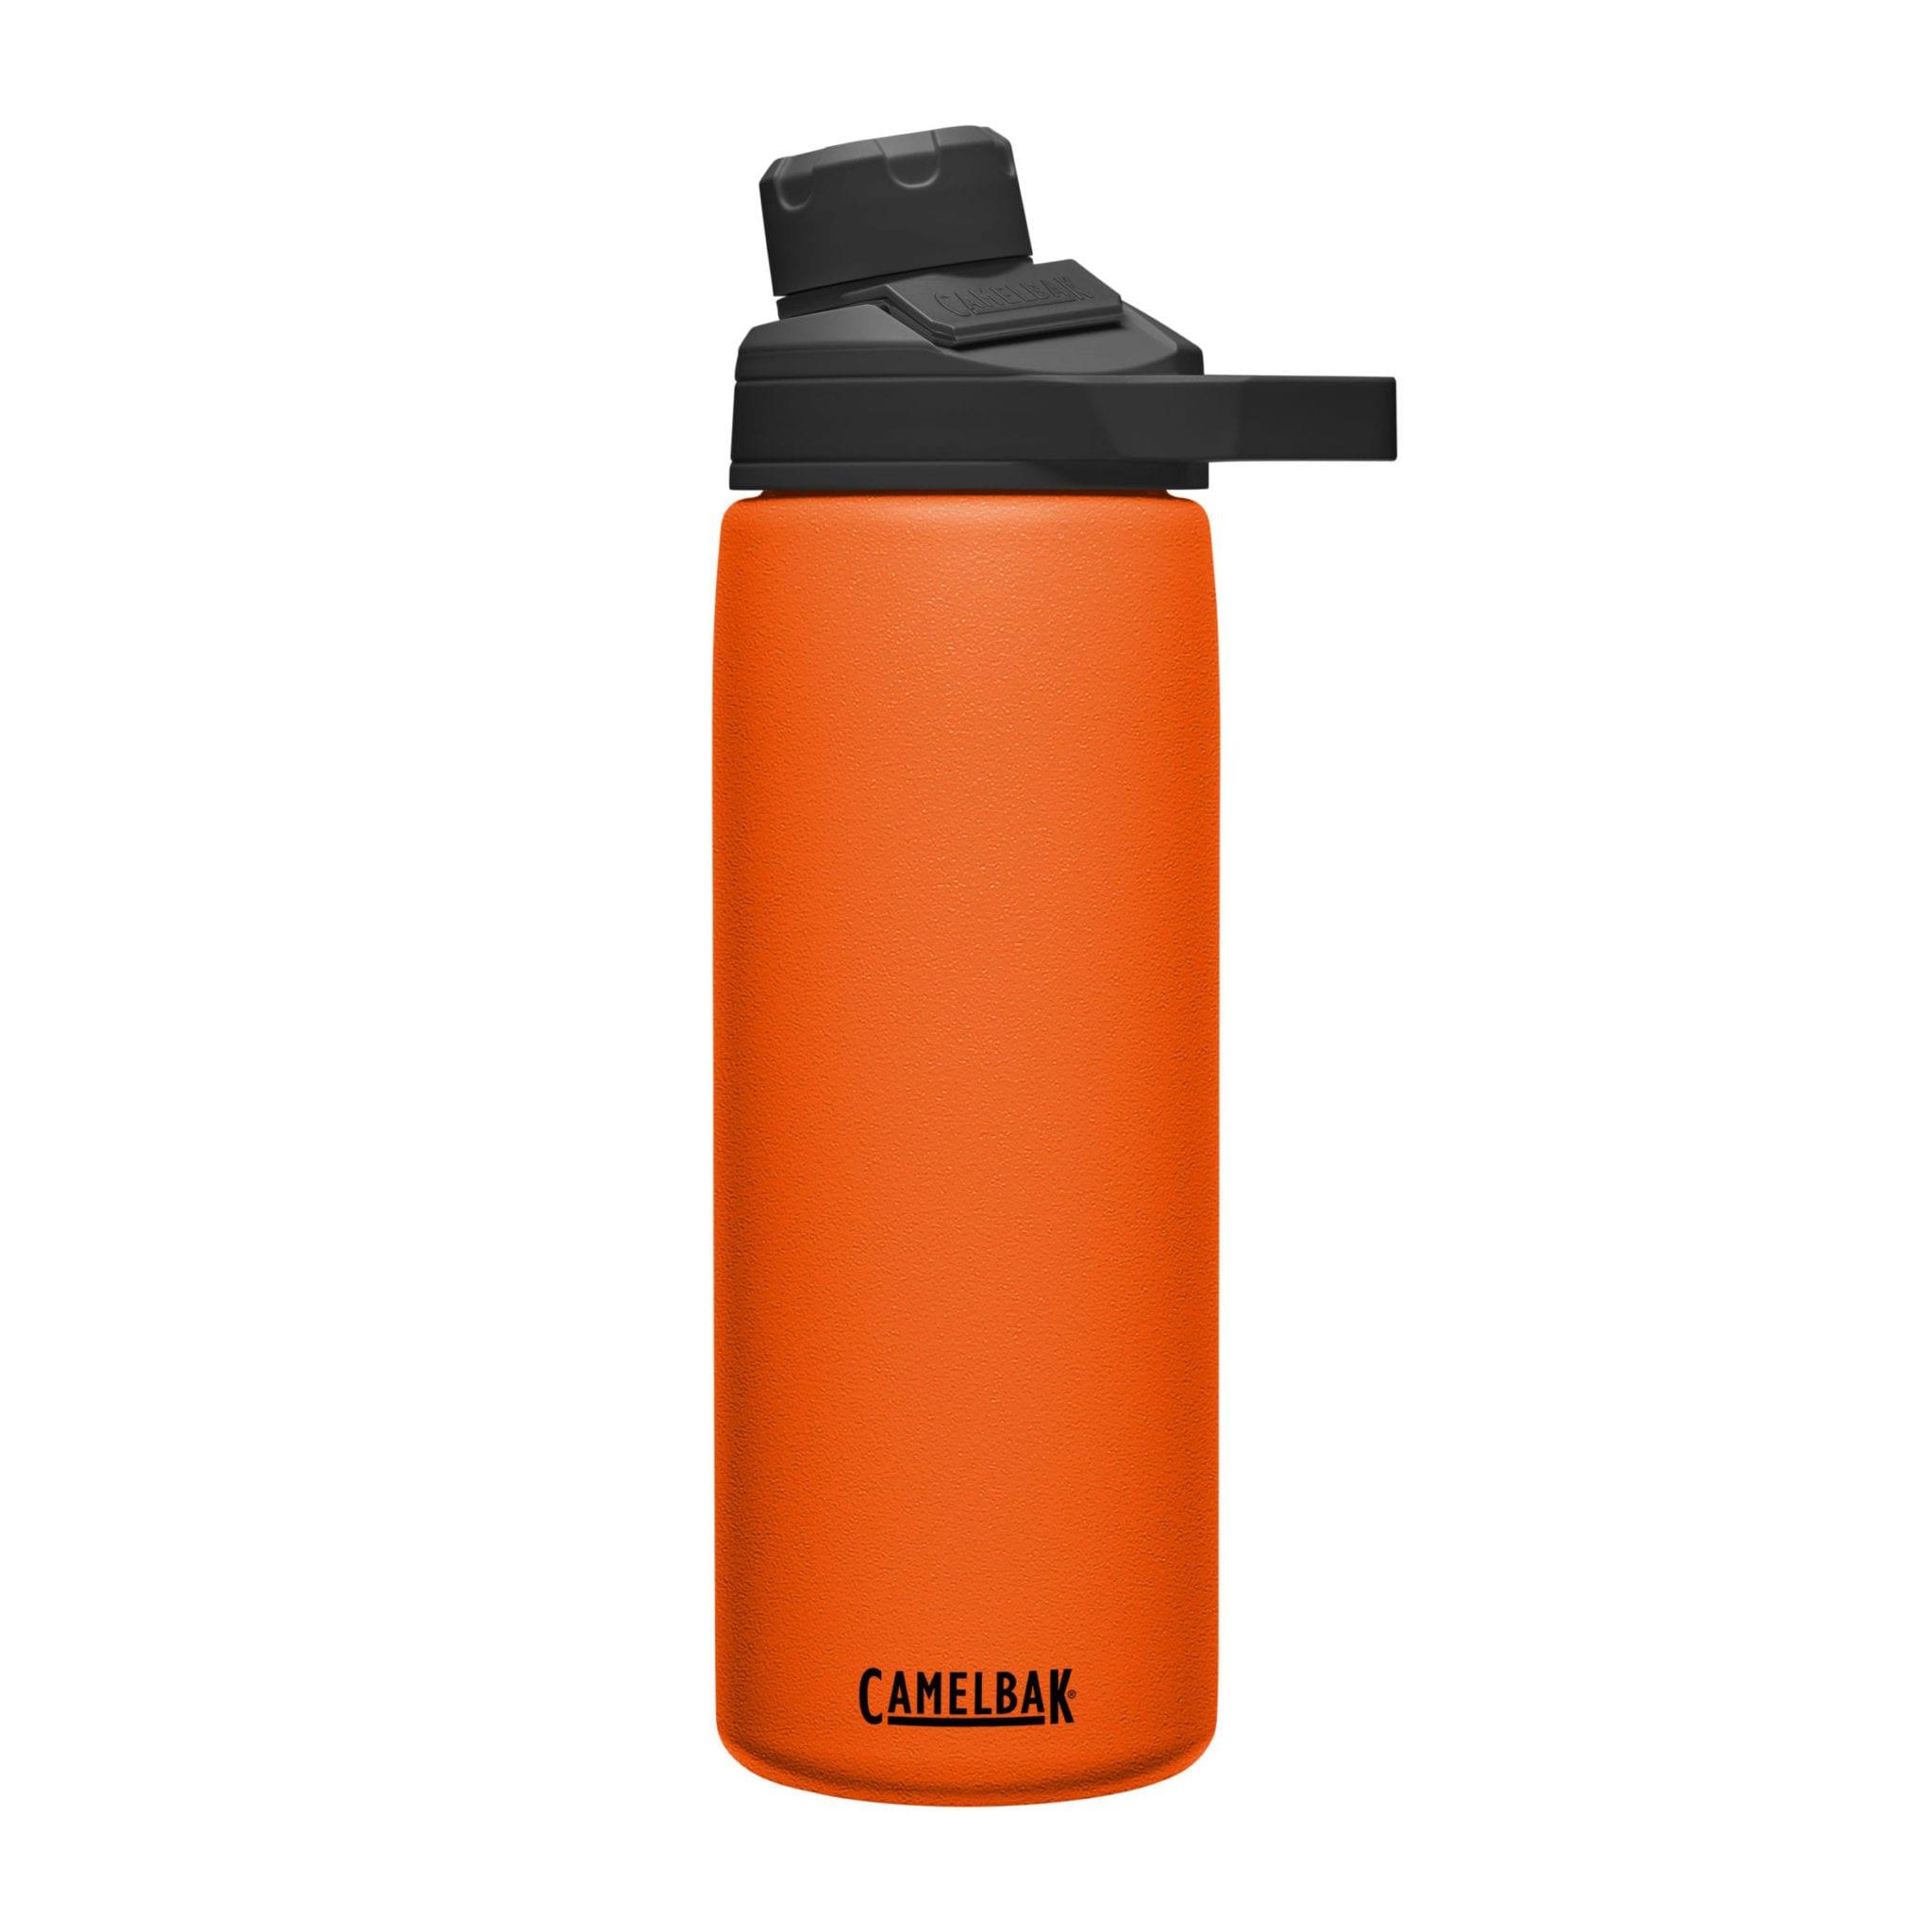 Promotional-Camelbak-Chute-Vacuum-0.6L-Koi-41-scaled